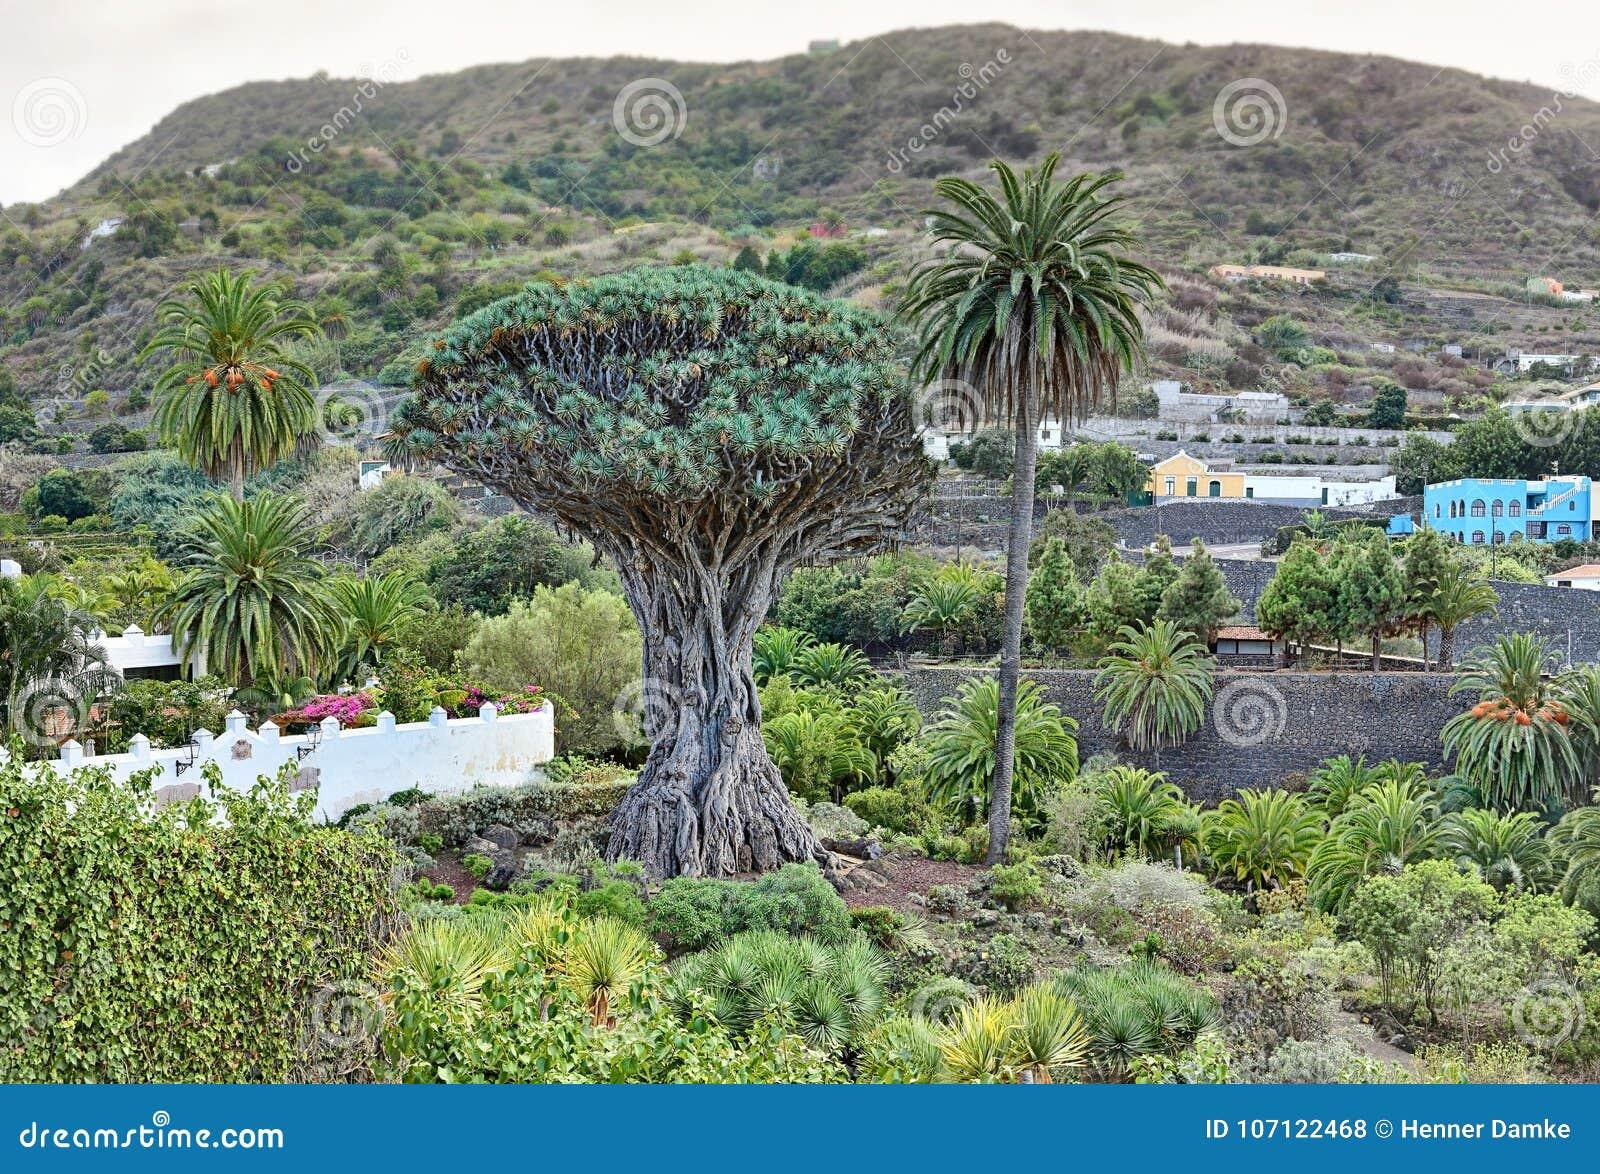 Dragon Tree Drago Milenario famoso em Icod de los Vinos - Tenerife